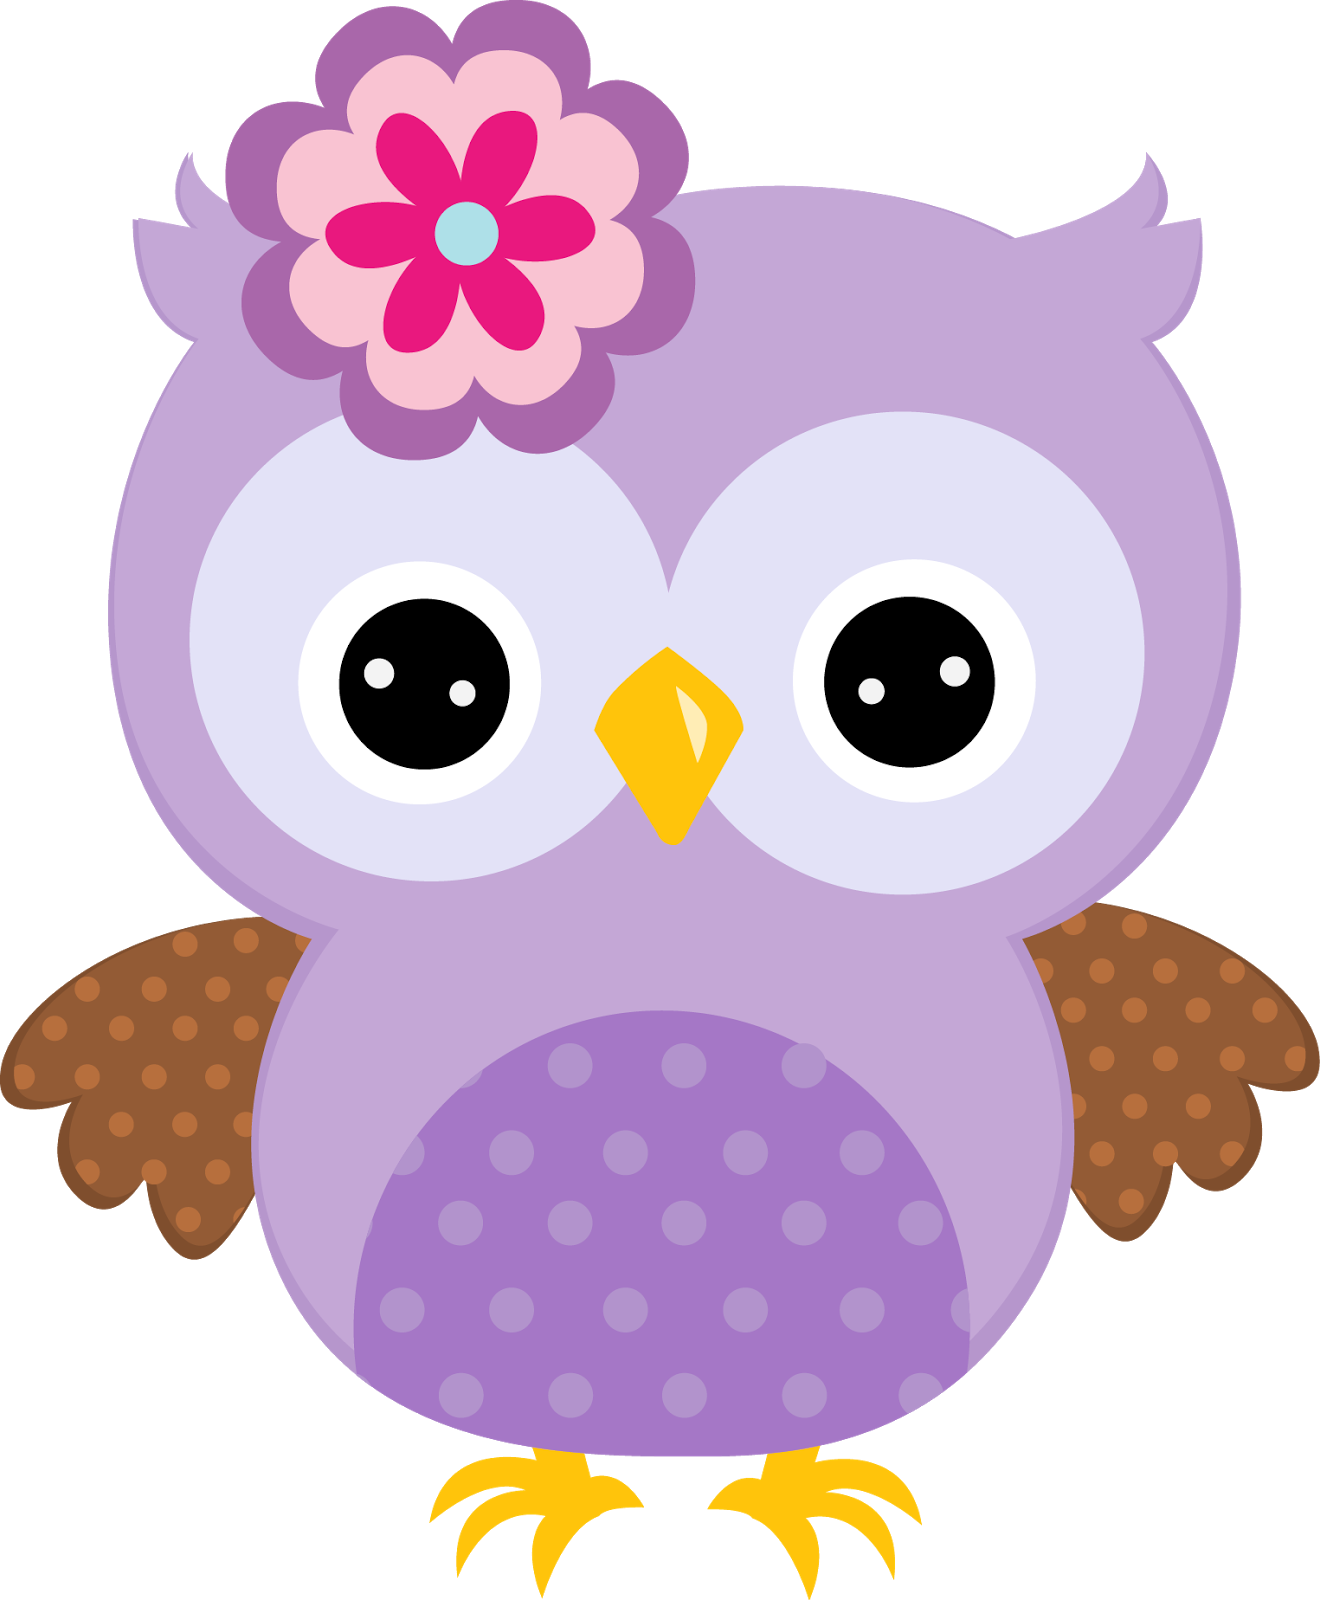 Imagenes De Dibujos De Búhos Animados Clip Art Pinterest Owl